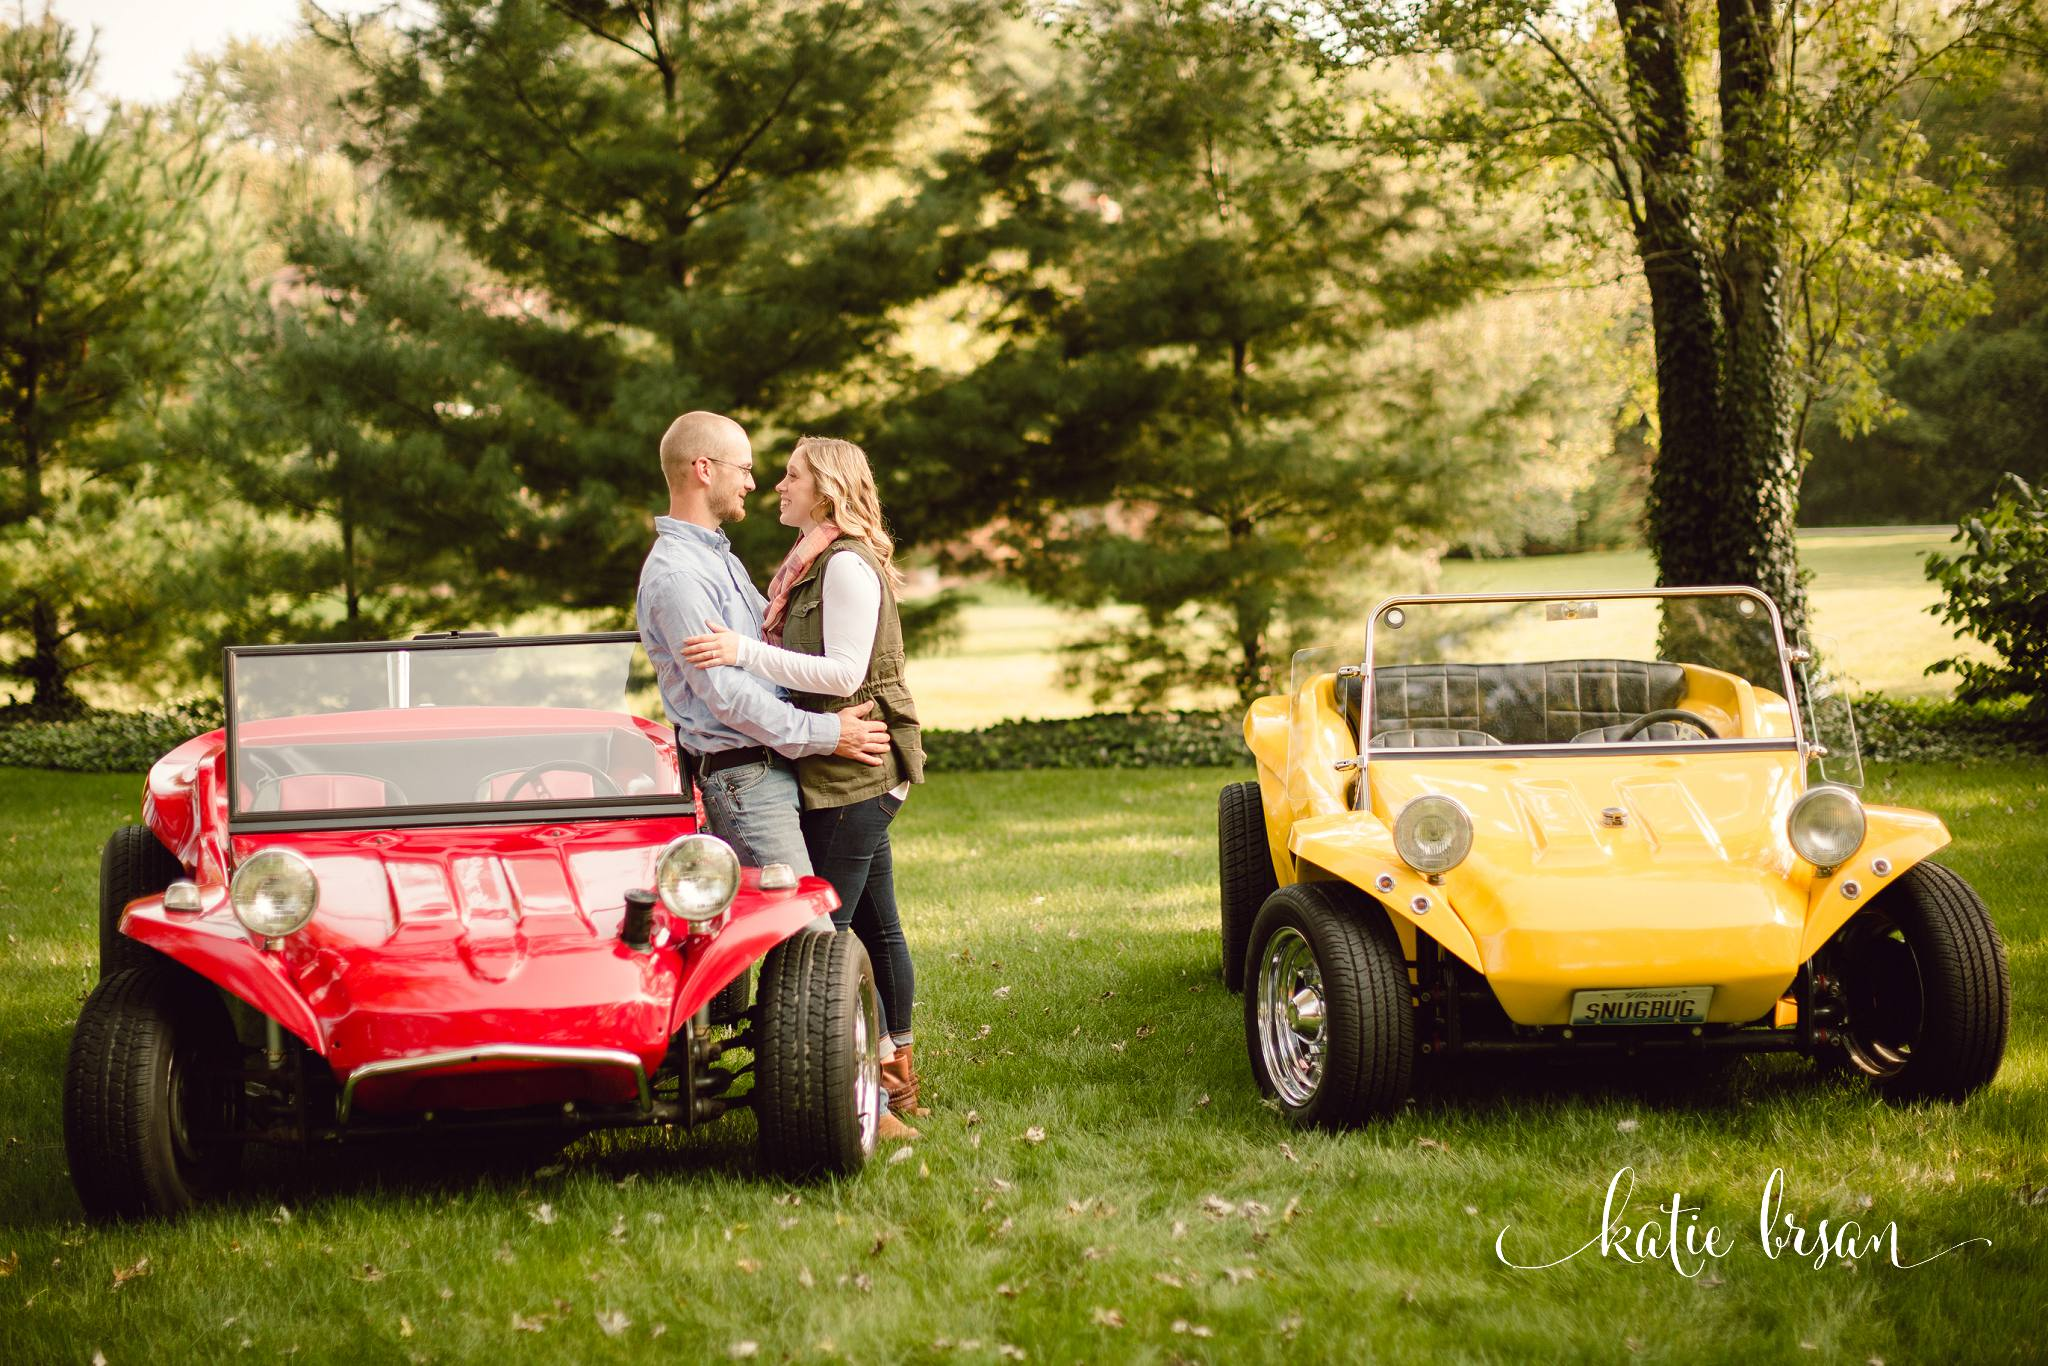 KatieBrsan-Frankfort-EngagementPhotos_0497.jpg